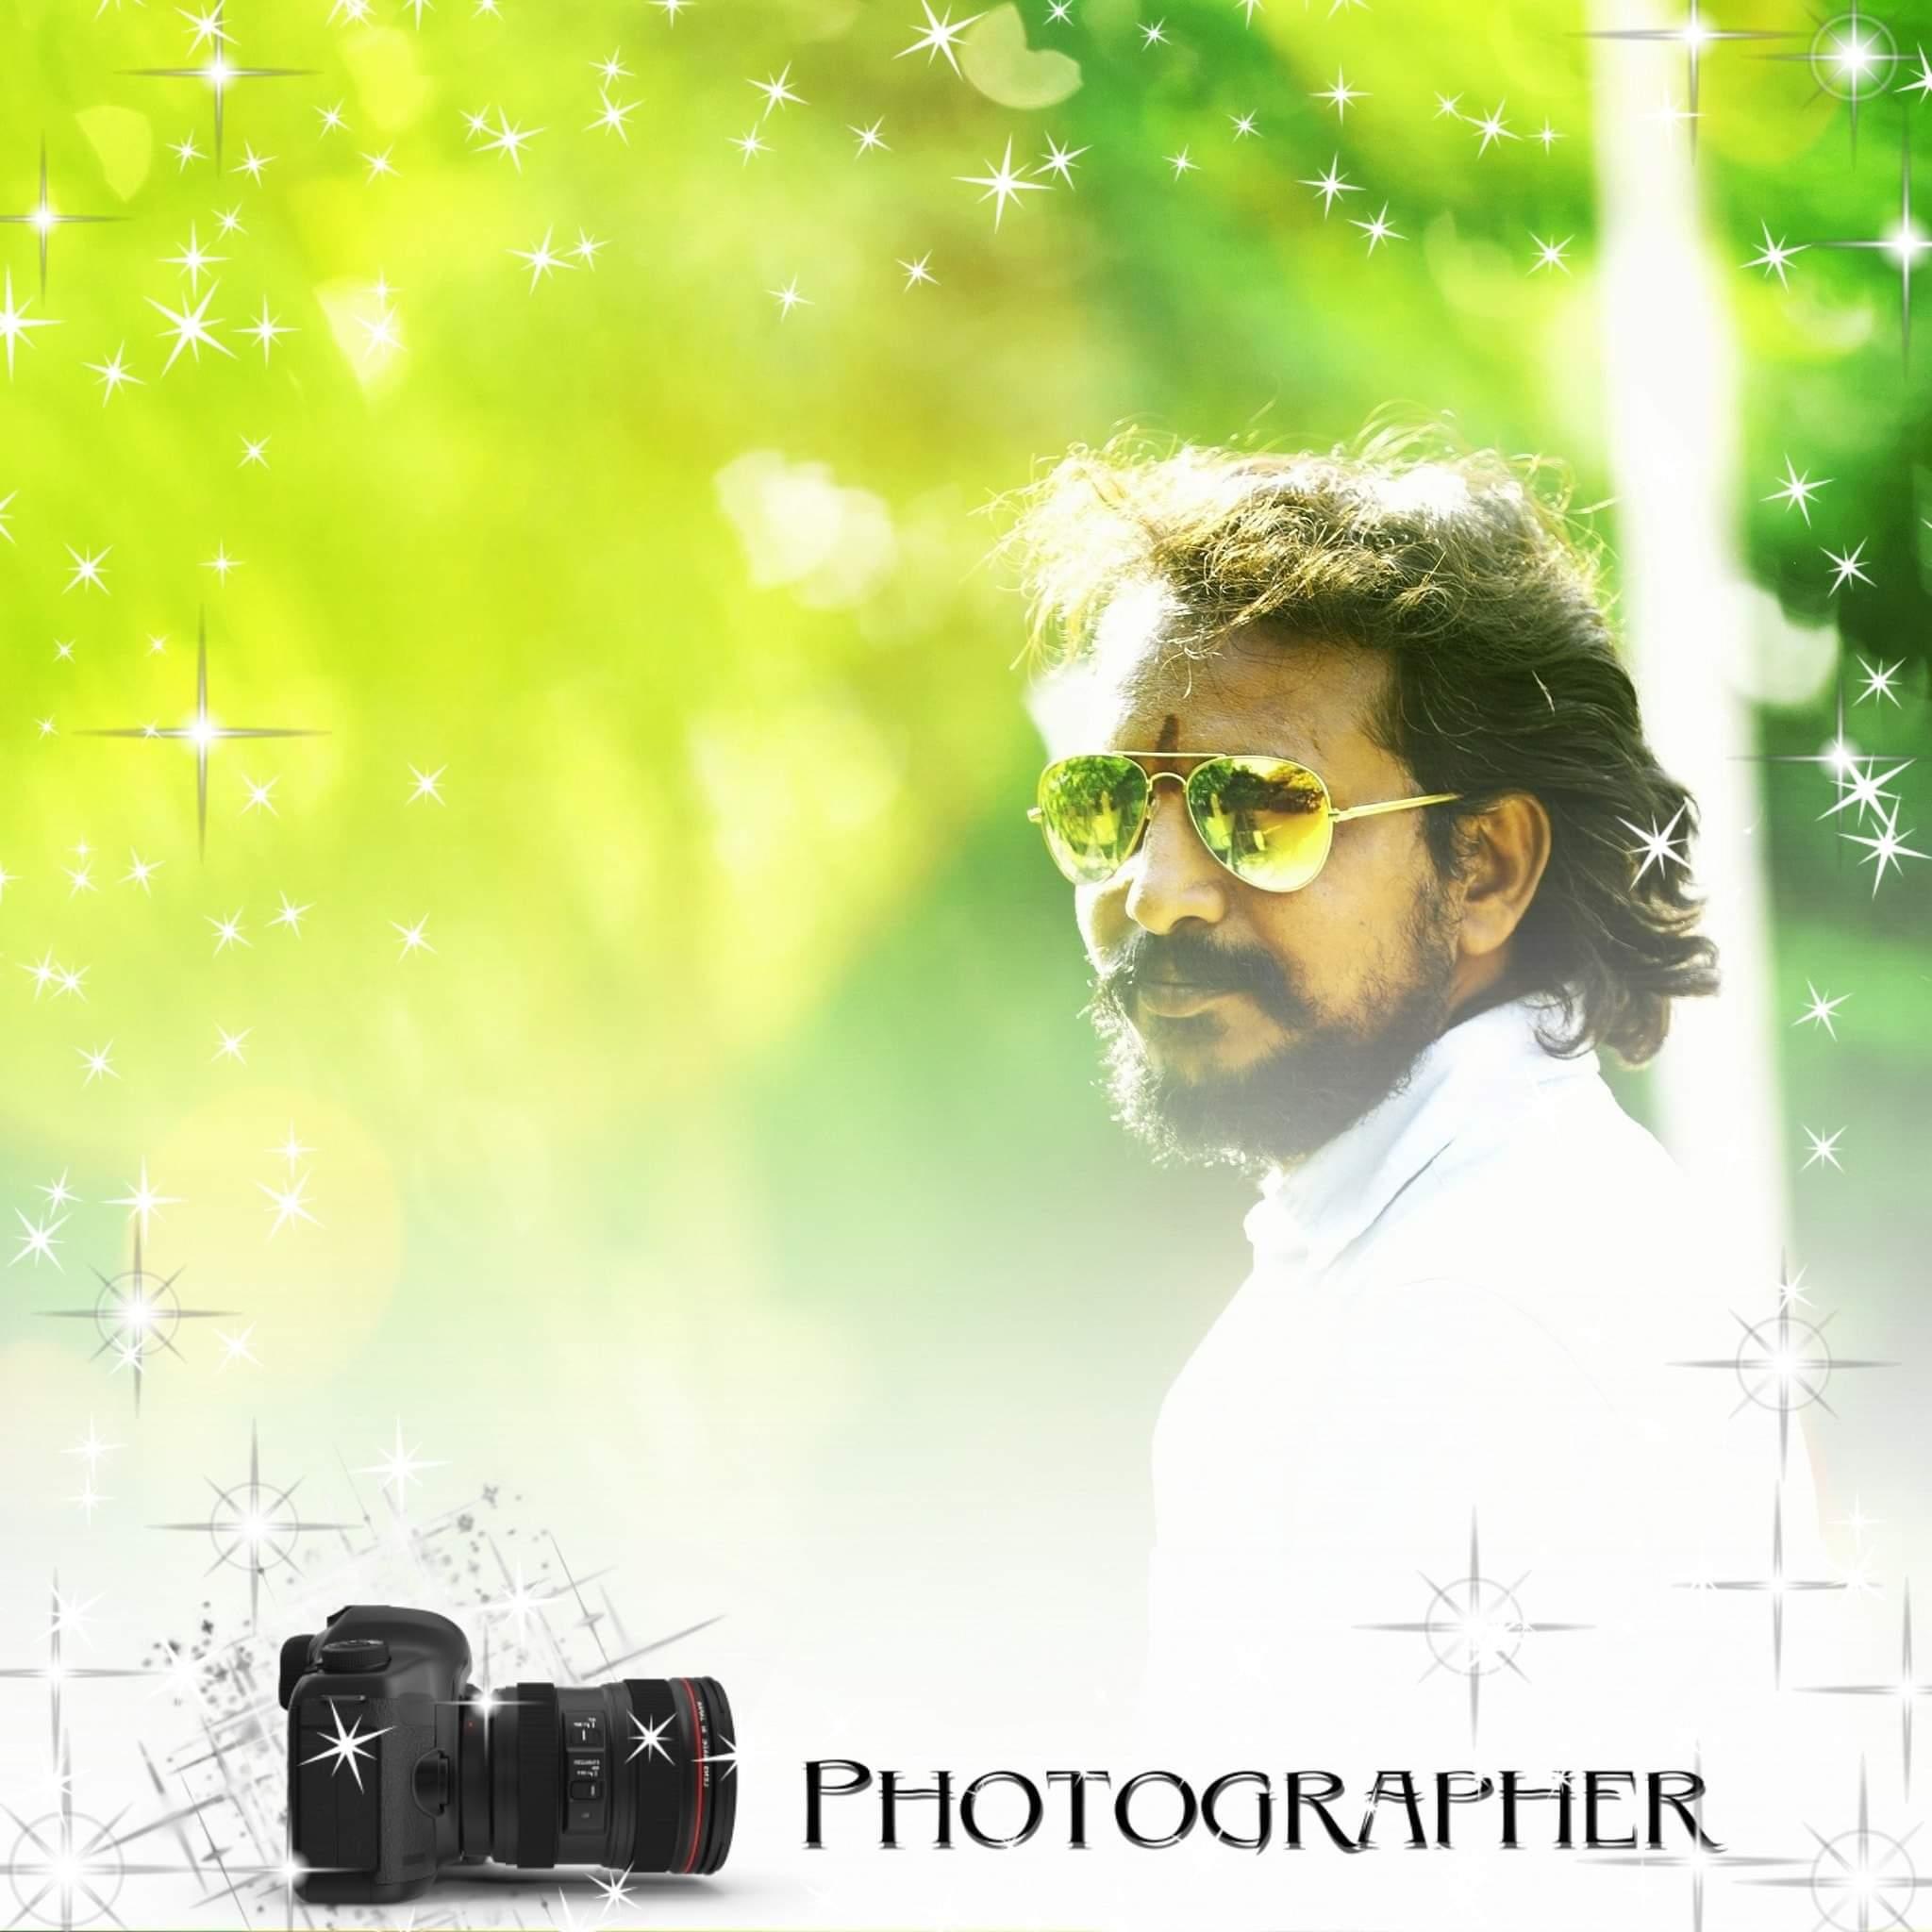 RKS Dgtals photography